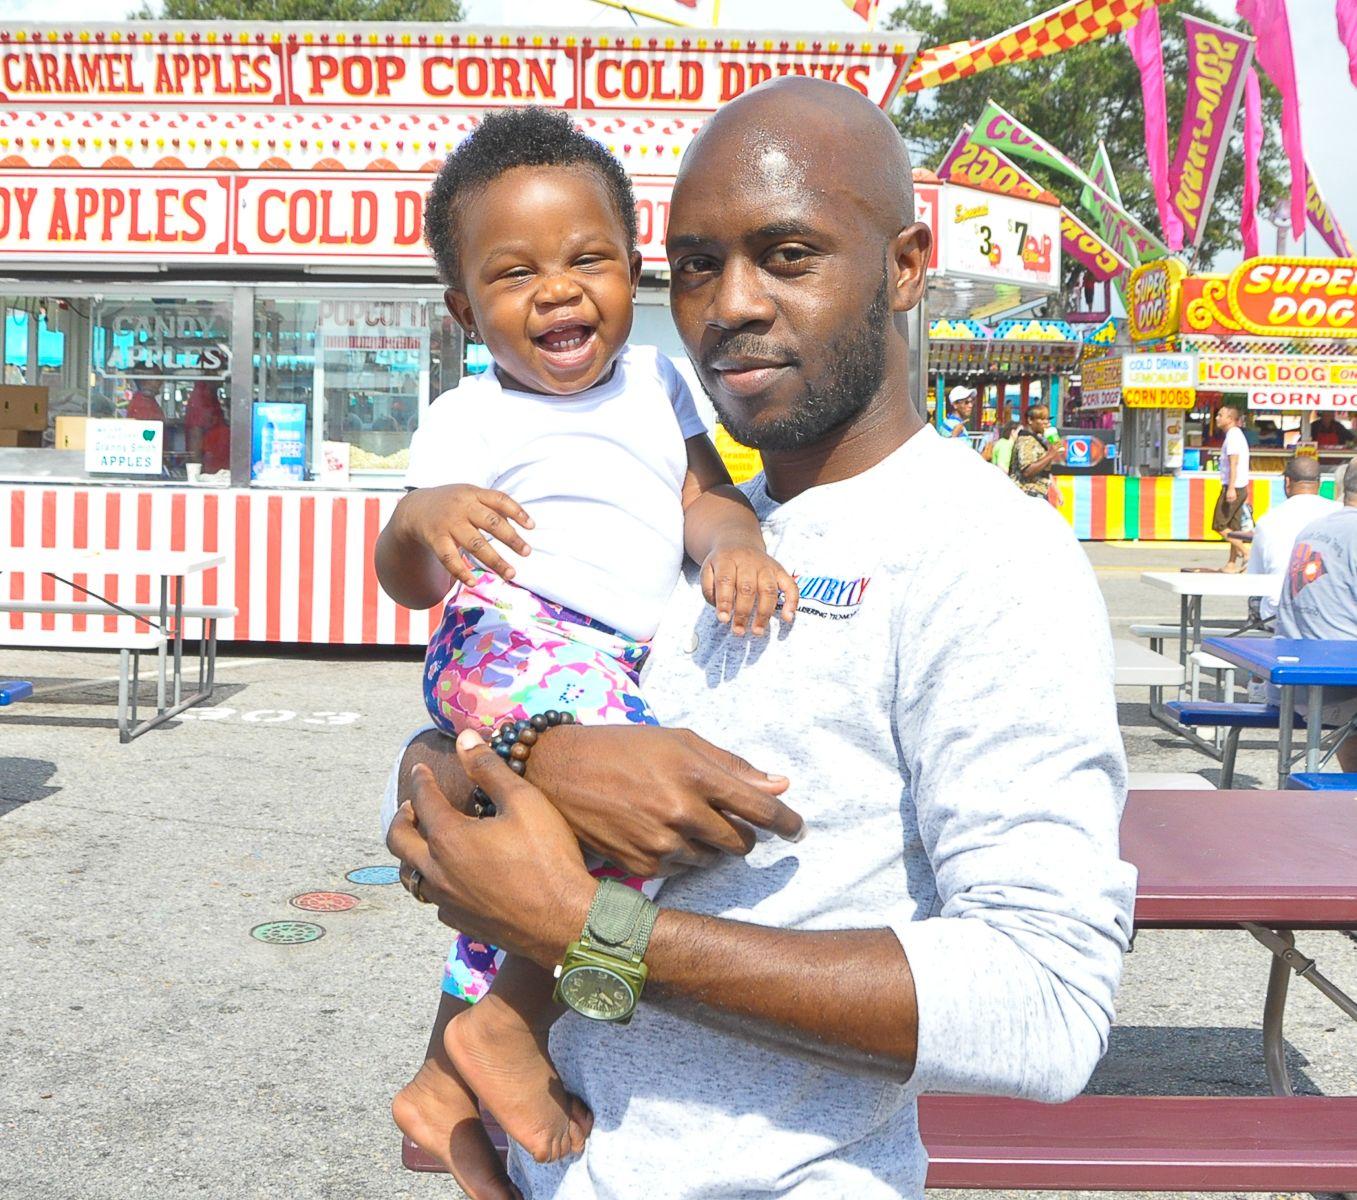 2014 #SCSTATEFAIR #MadisonGraceWilliams #Fatherhood